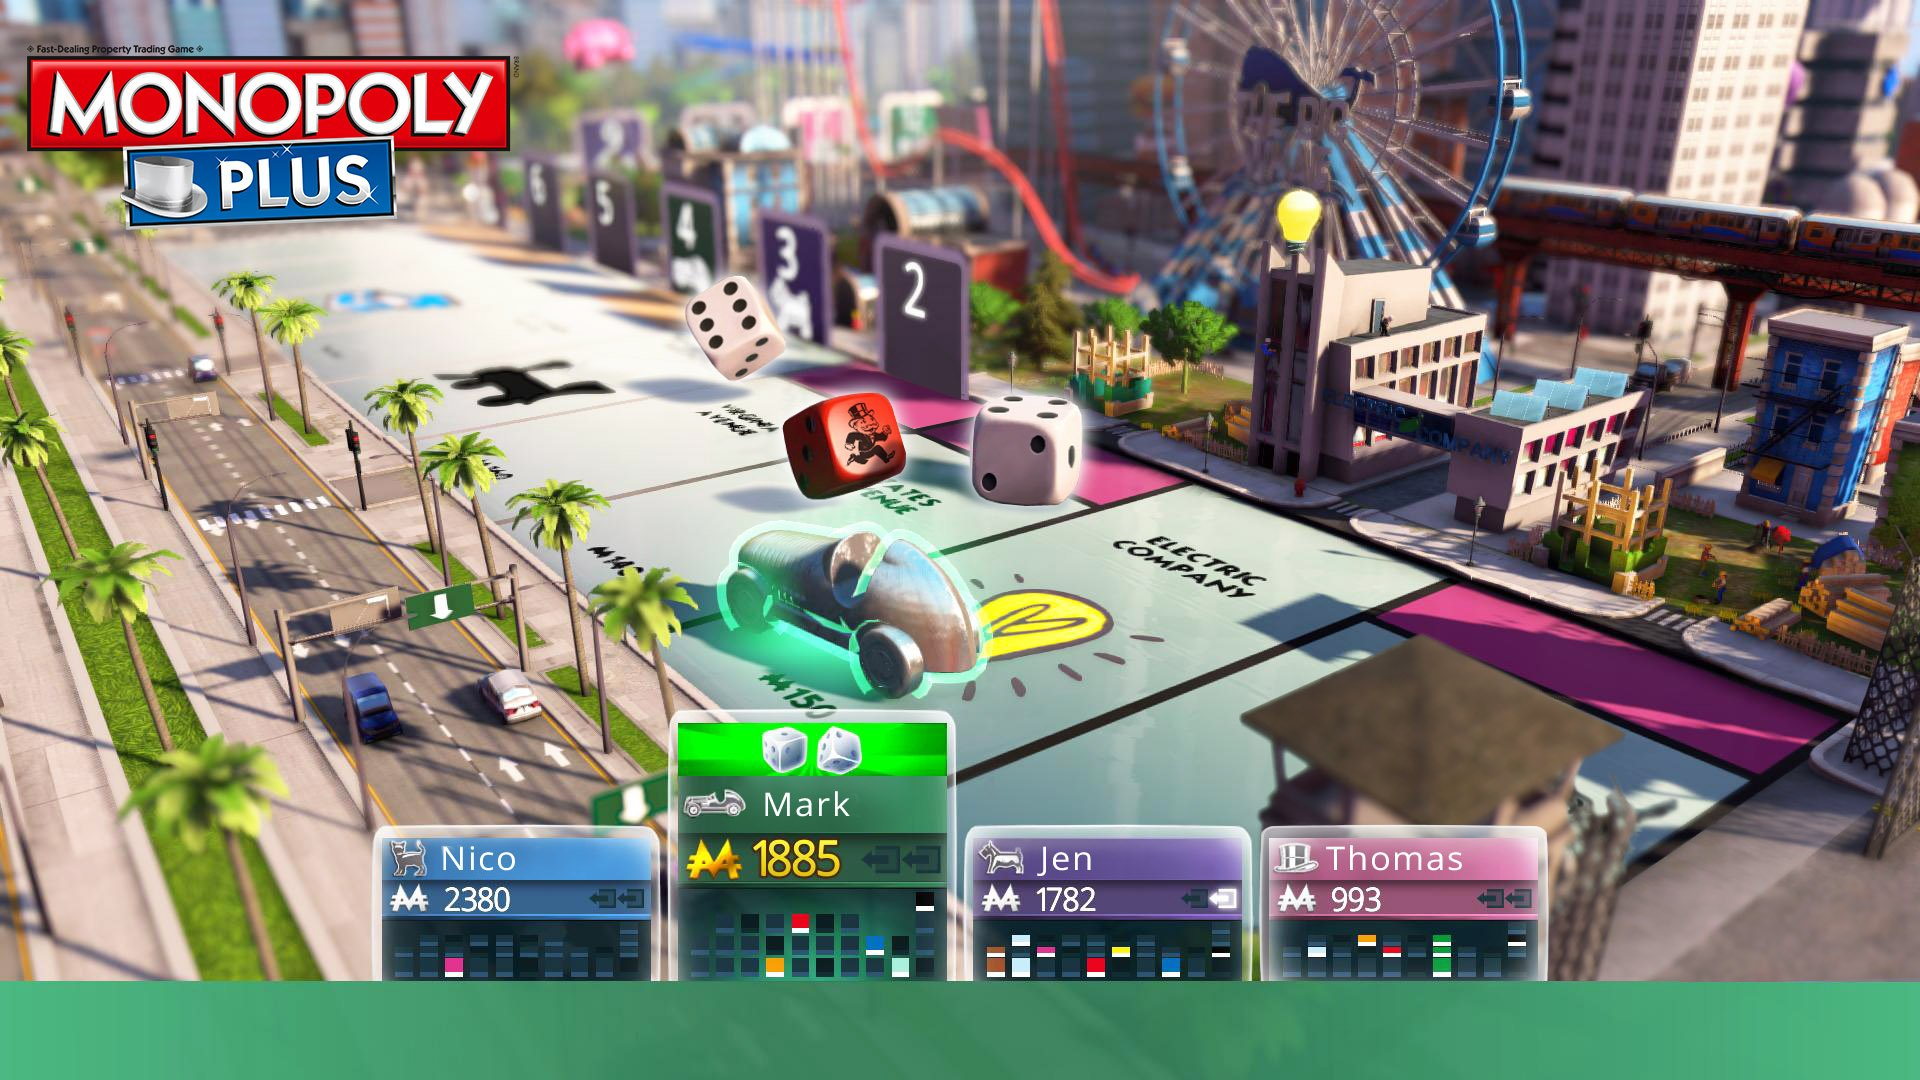 HBG Monopoly Plus Screens 4